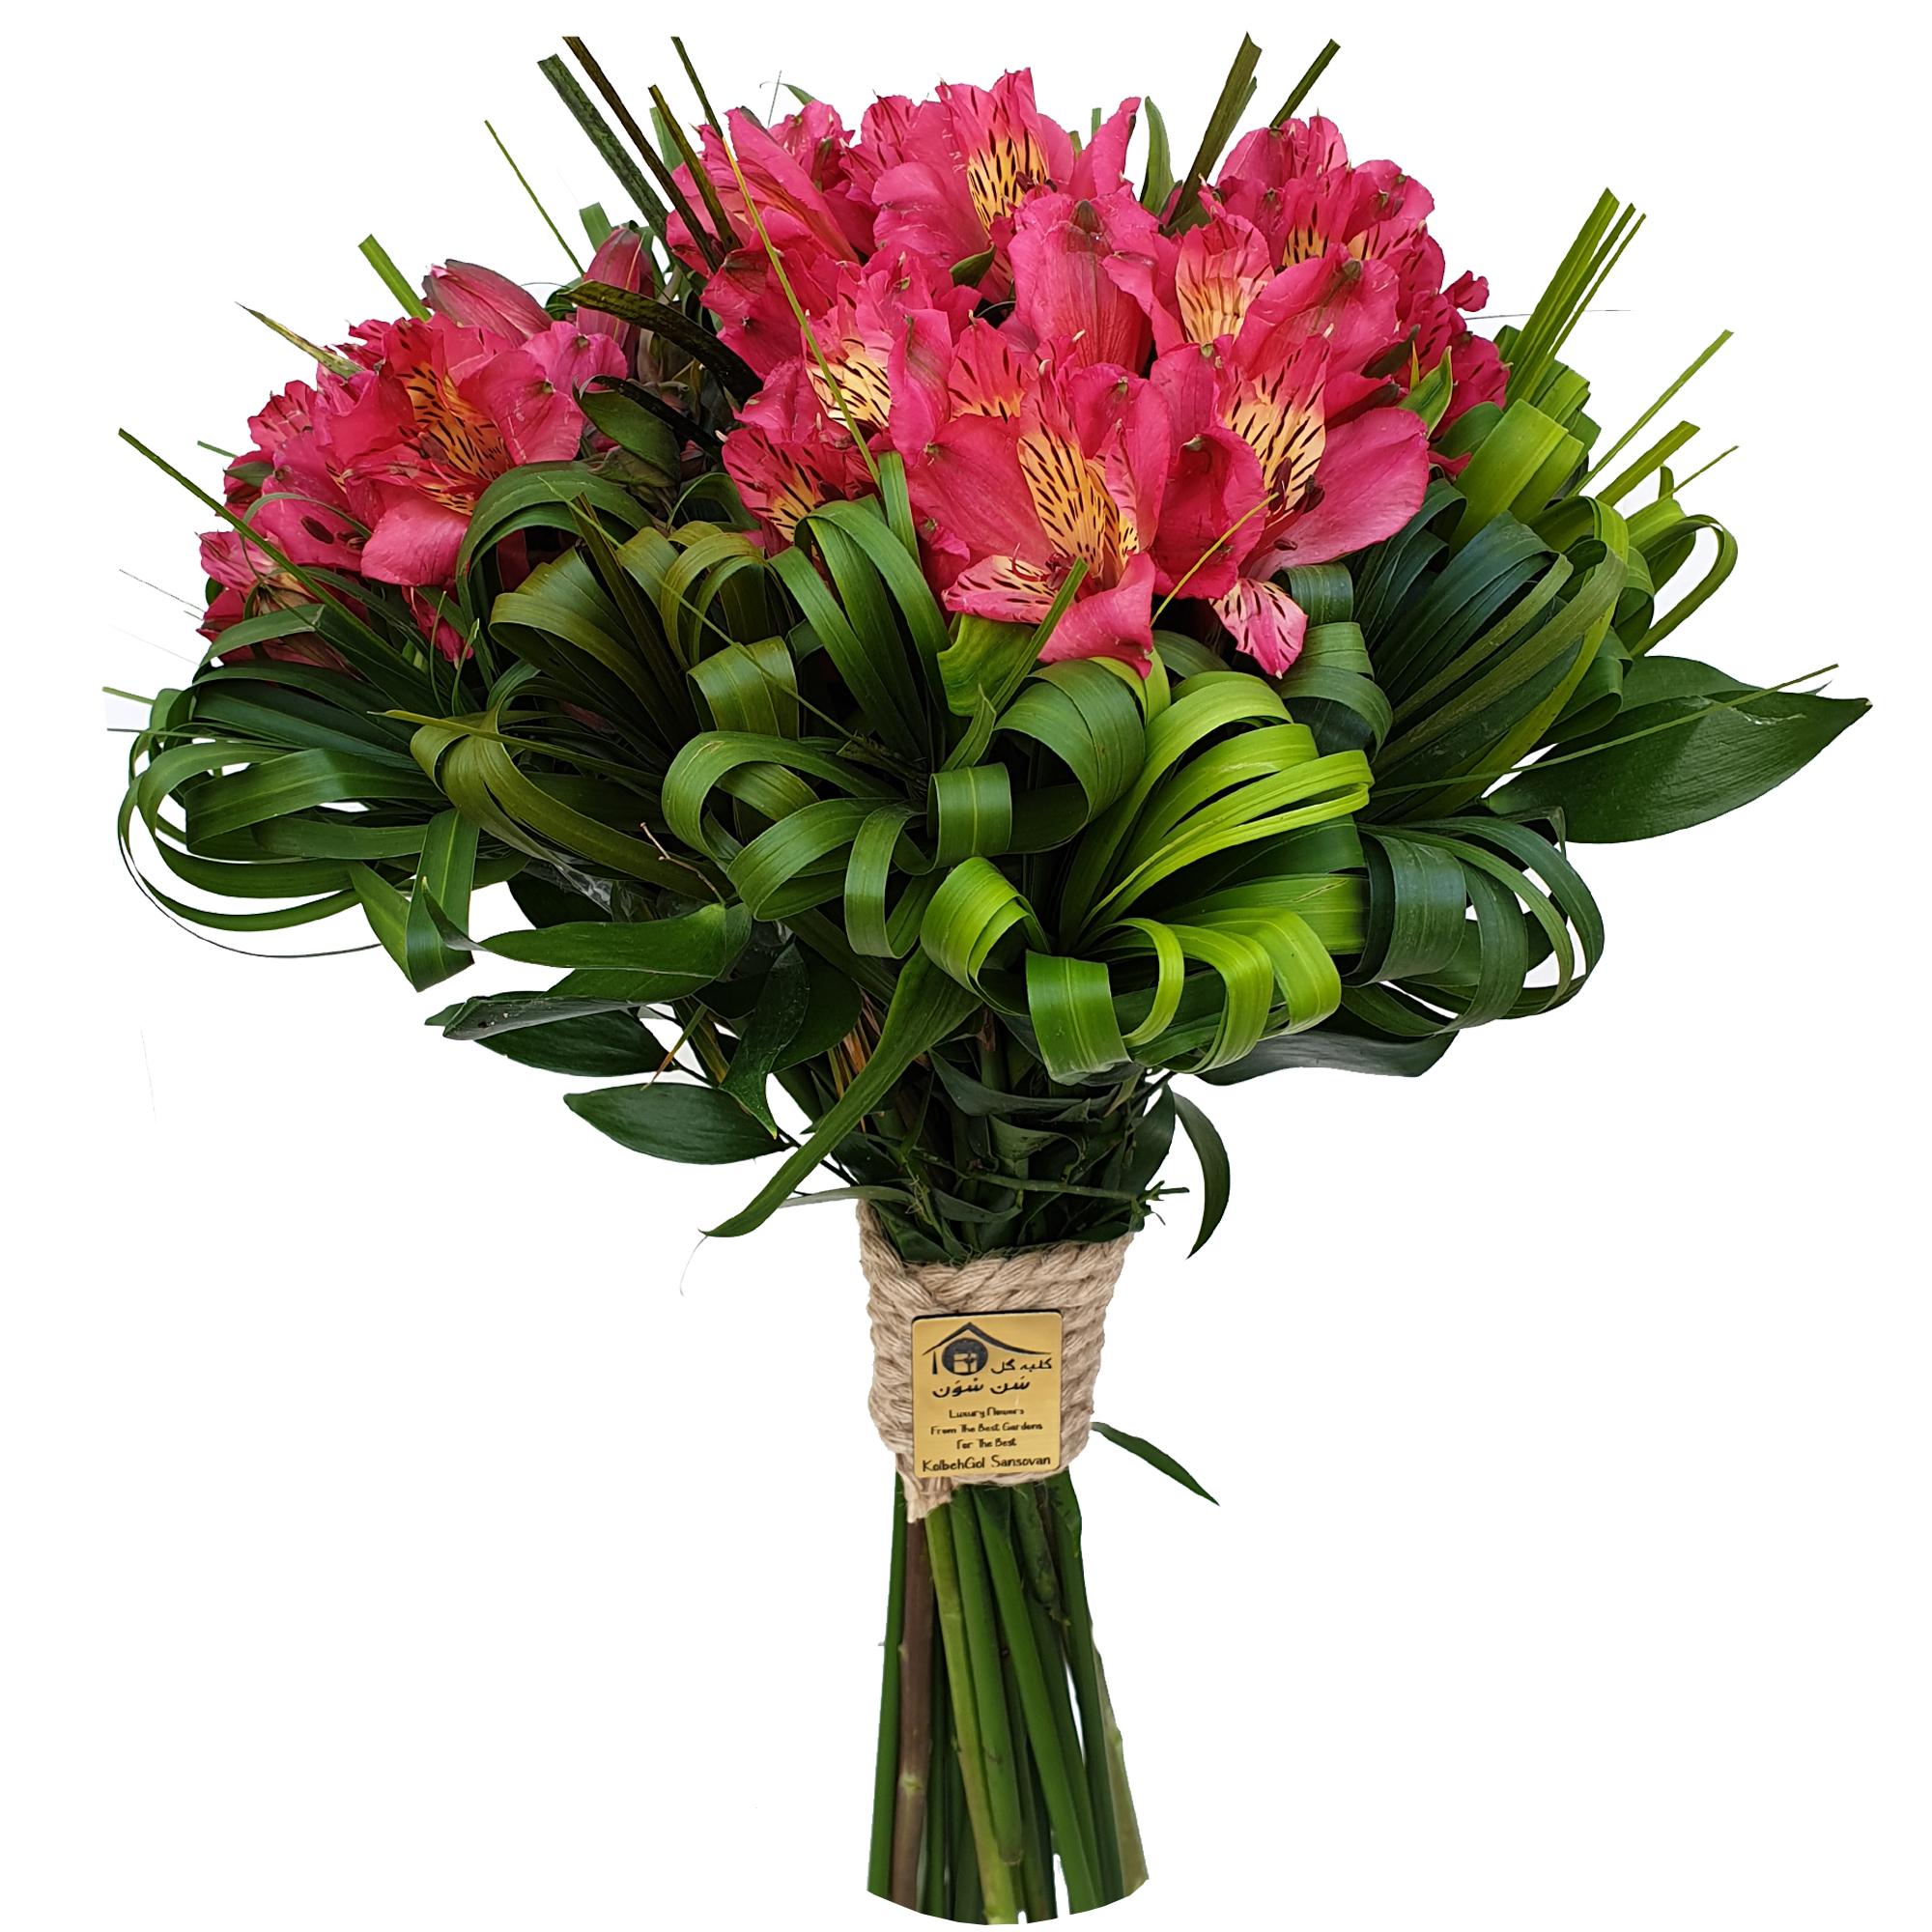 دسته گل کلبه گل سن سون مدل DG-11014